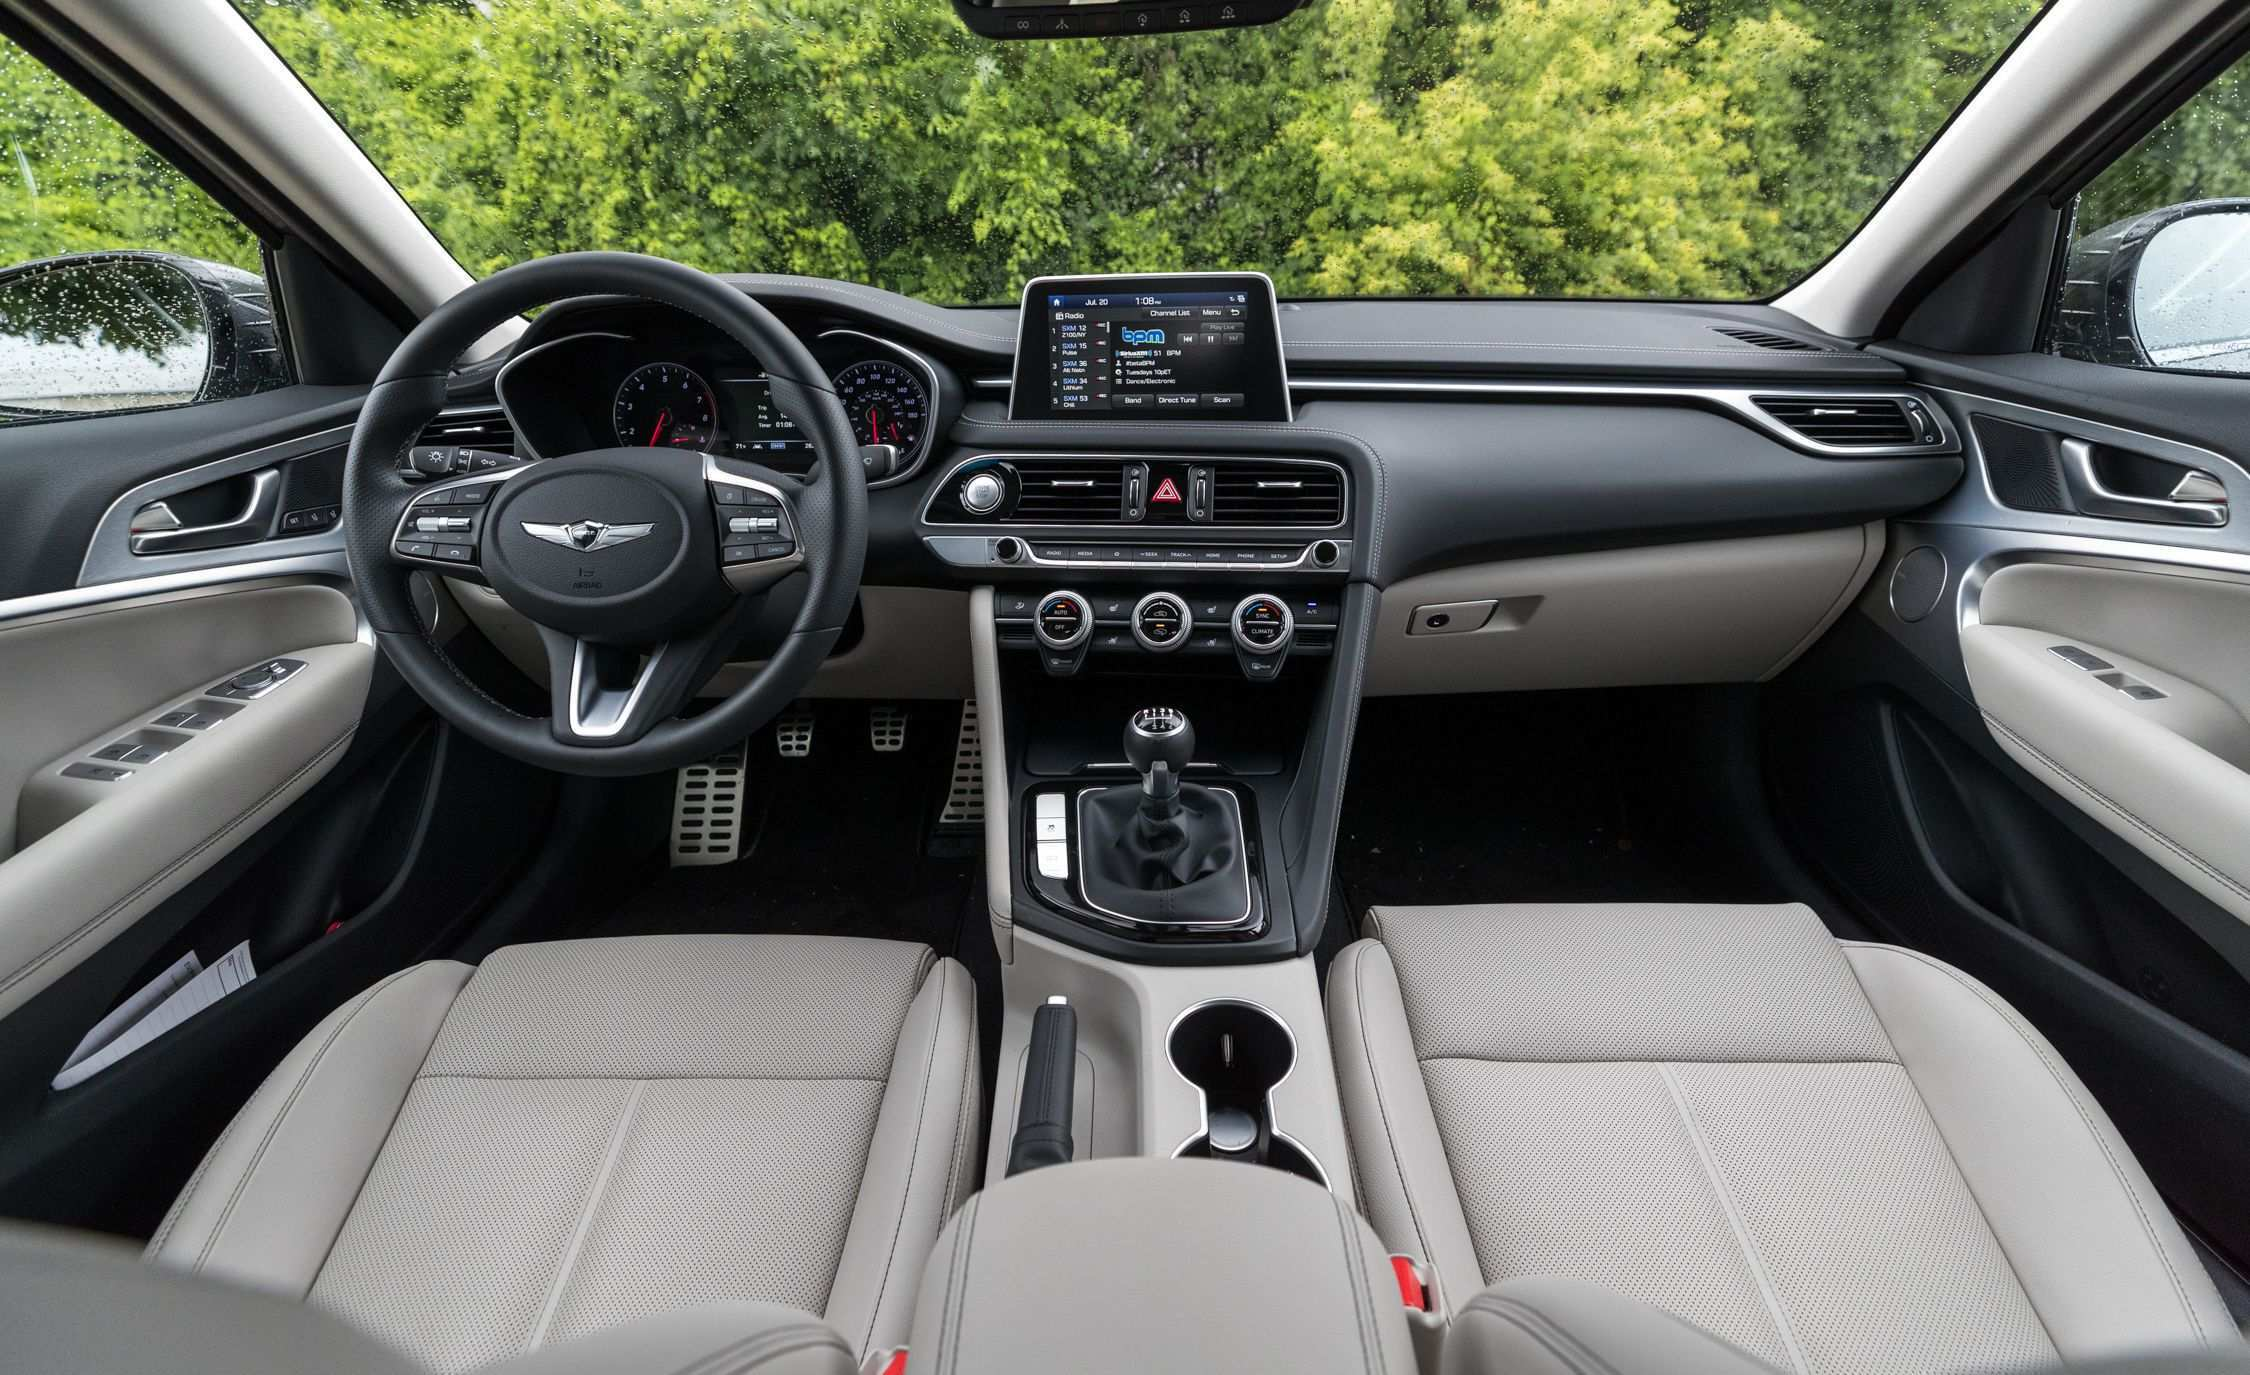 42 All New 2019 Genesis G70 Specs Performance for 2019 Genesis G70 Specs